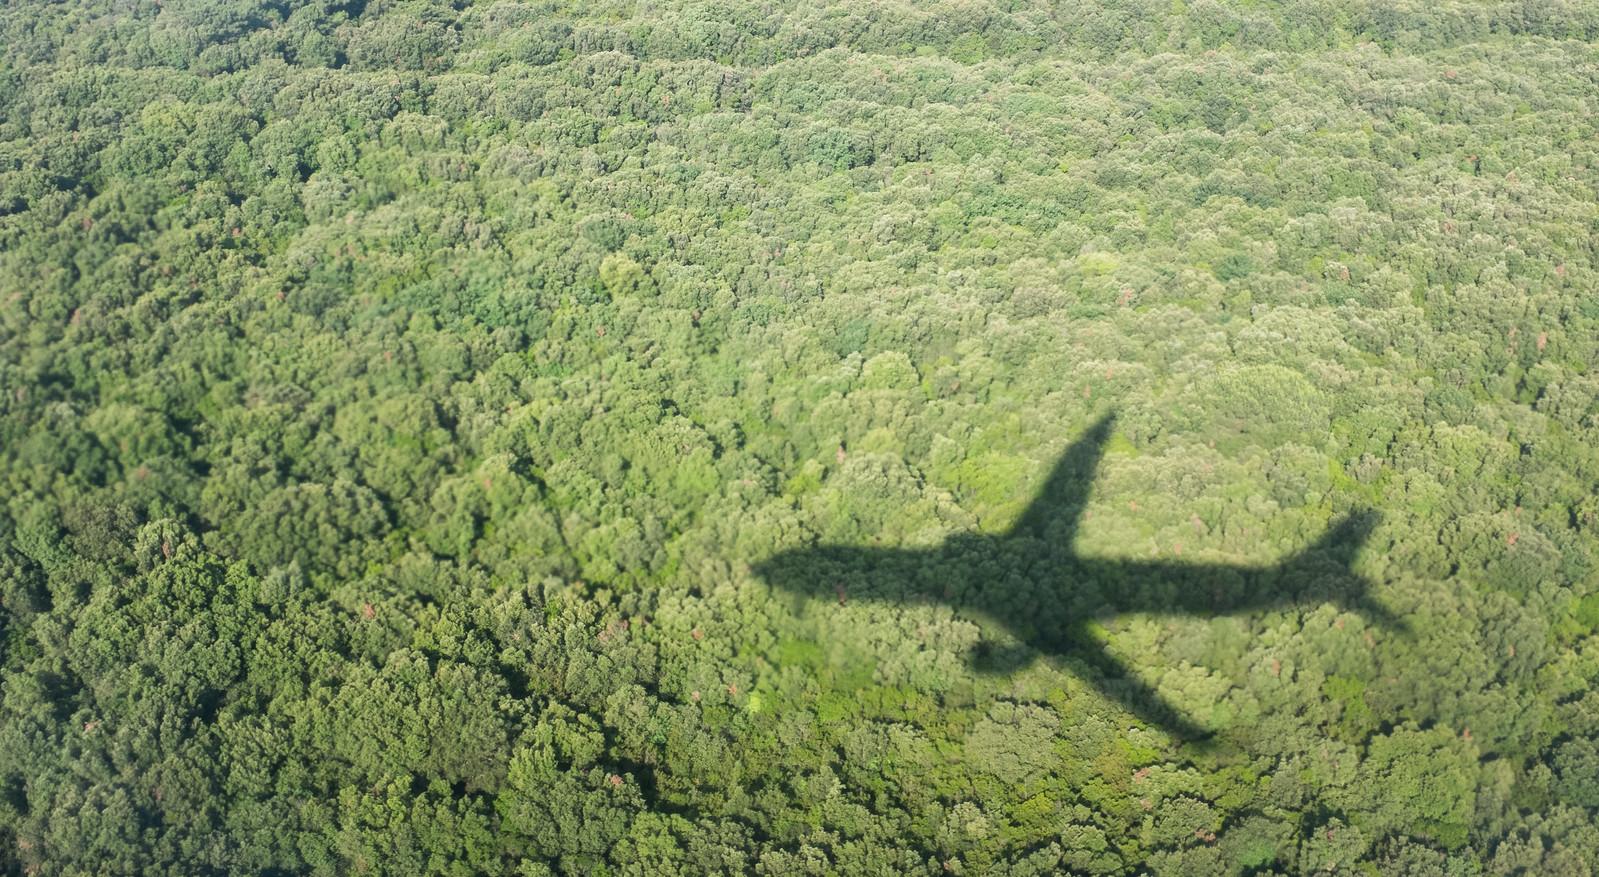 Airplane Shadow